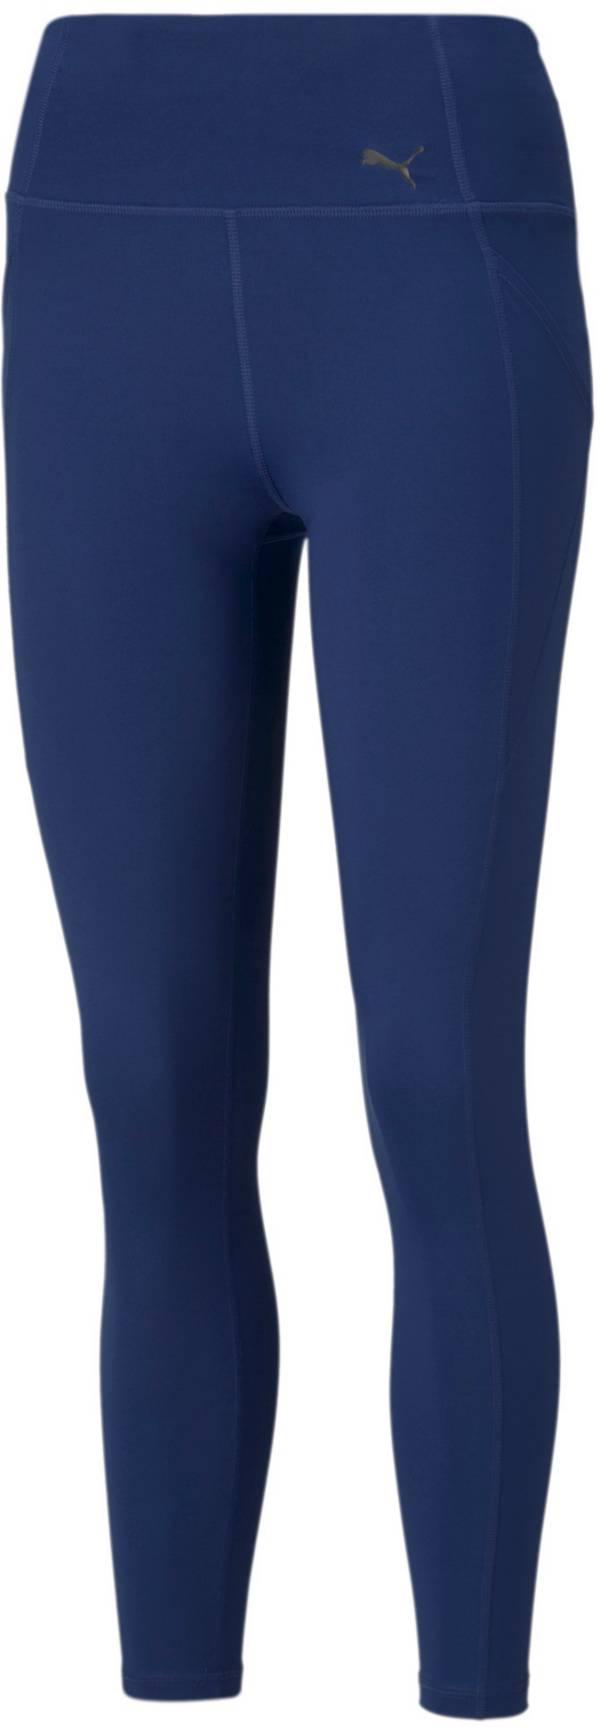 PUMA Women's Forever 7/8 Training Leggings product image